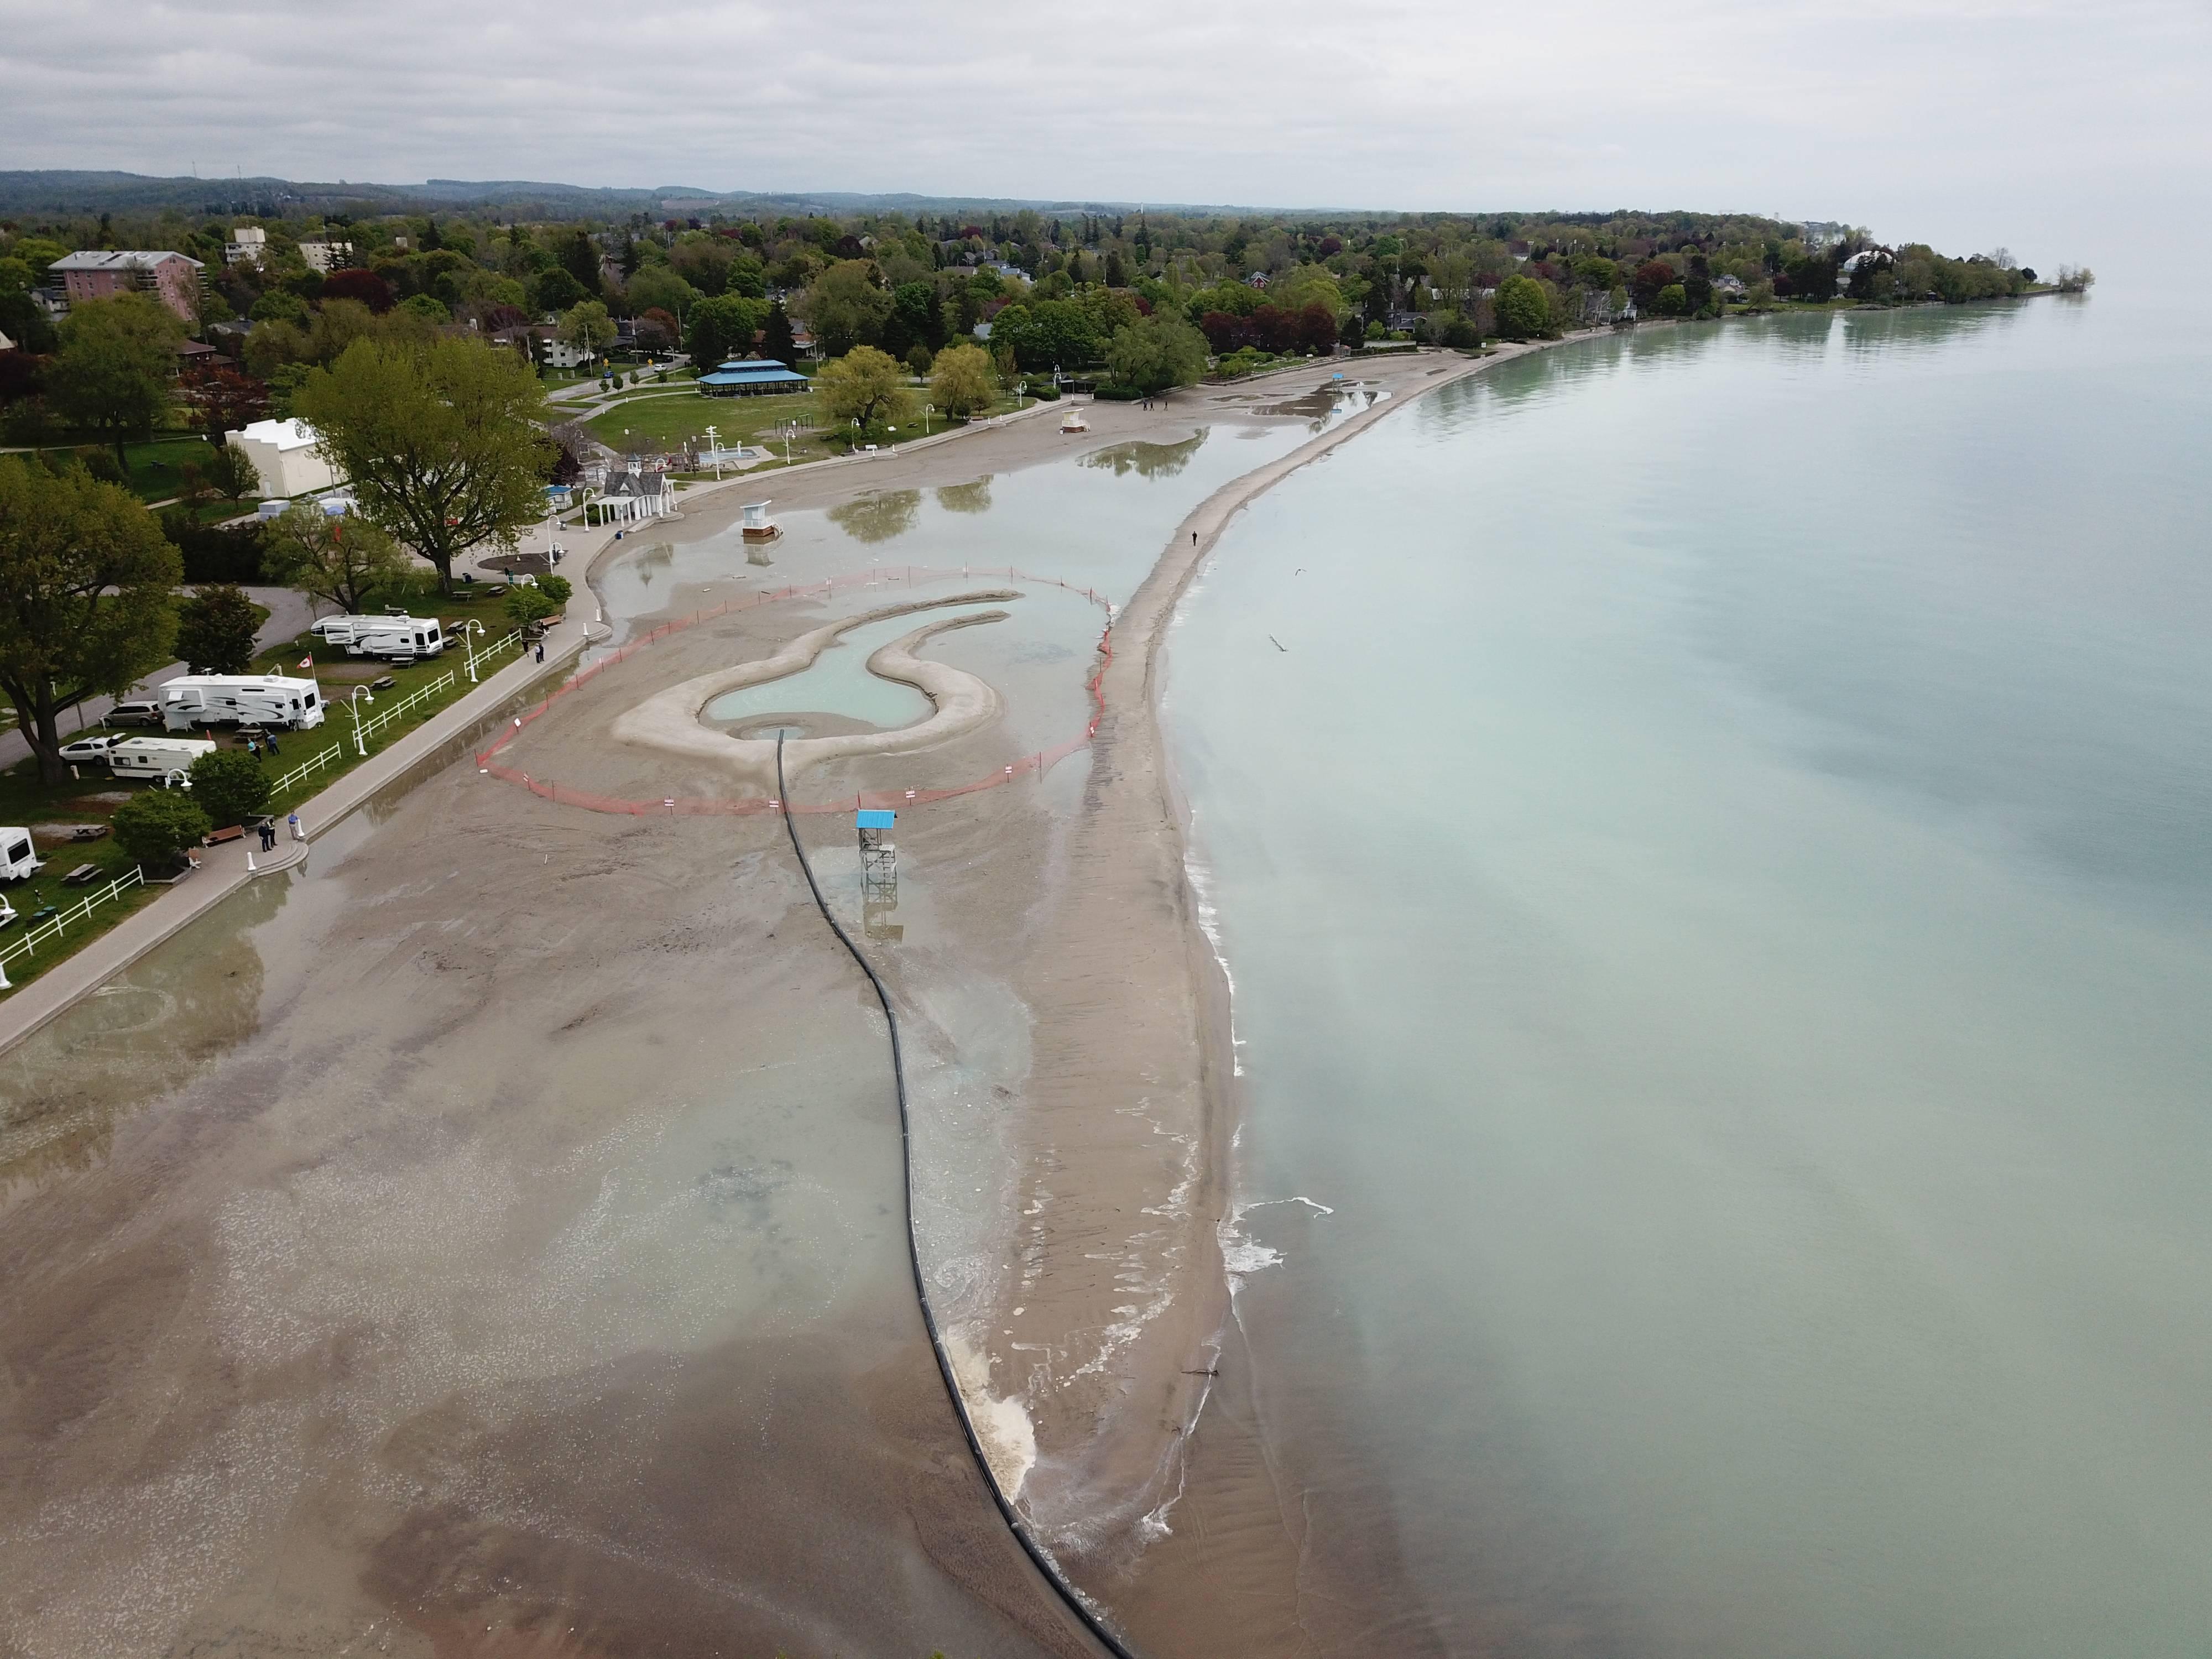 Lake Ontario at Cobourg, Ontario, 29 May 2019 (source:  Ganaraska Conservation)